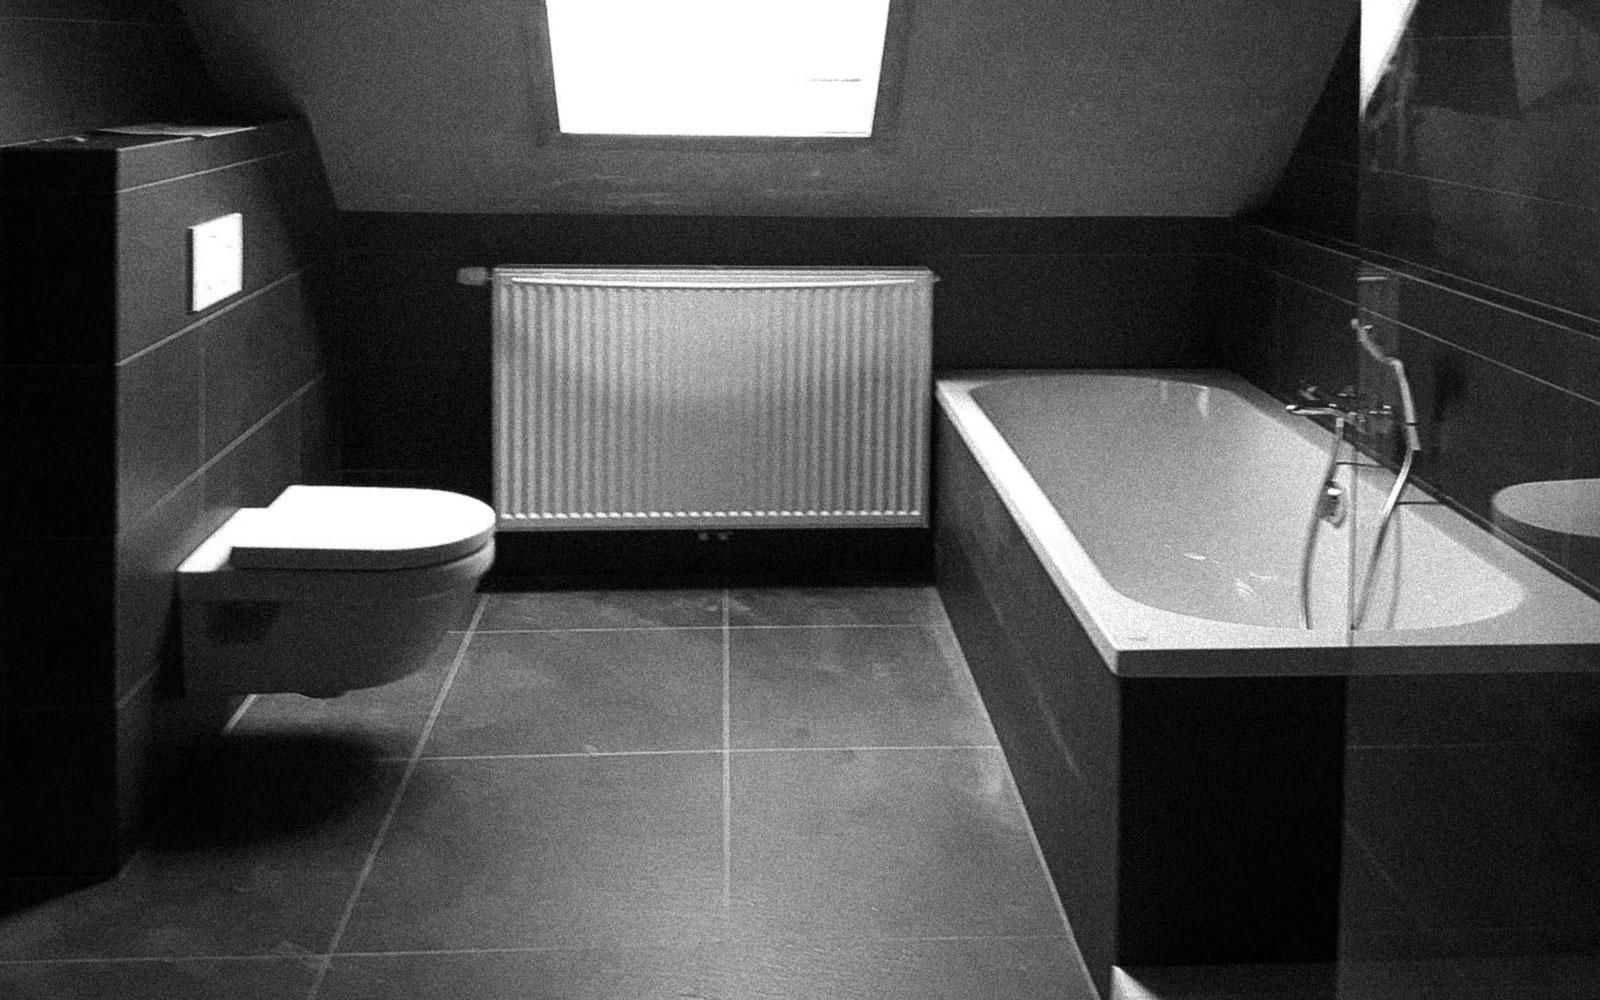 Home elias techniek - Badkamer renovatie m ...